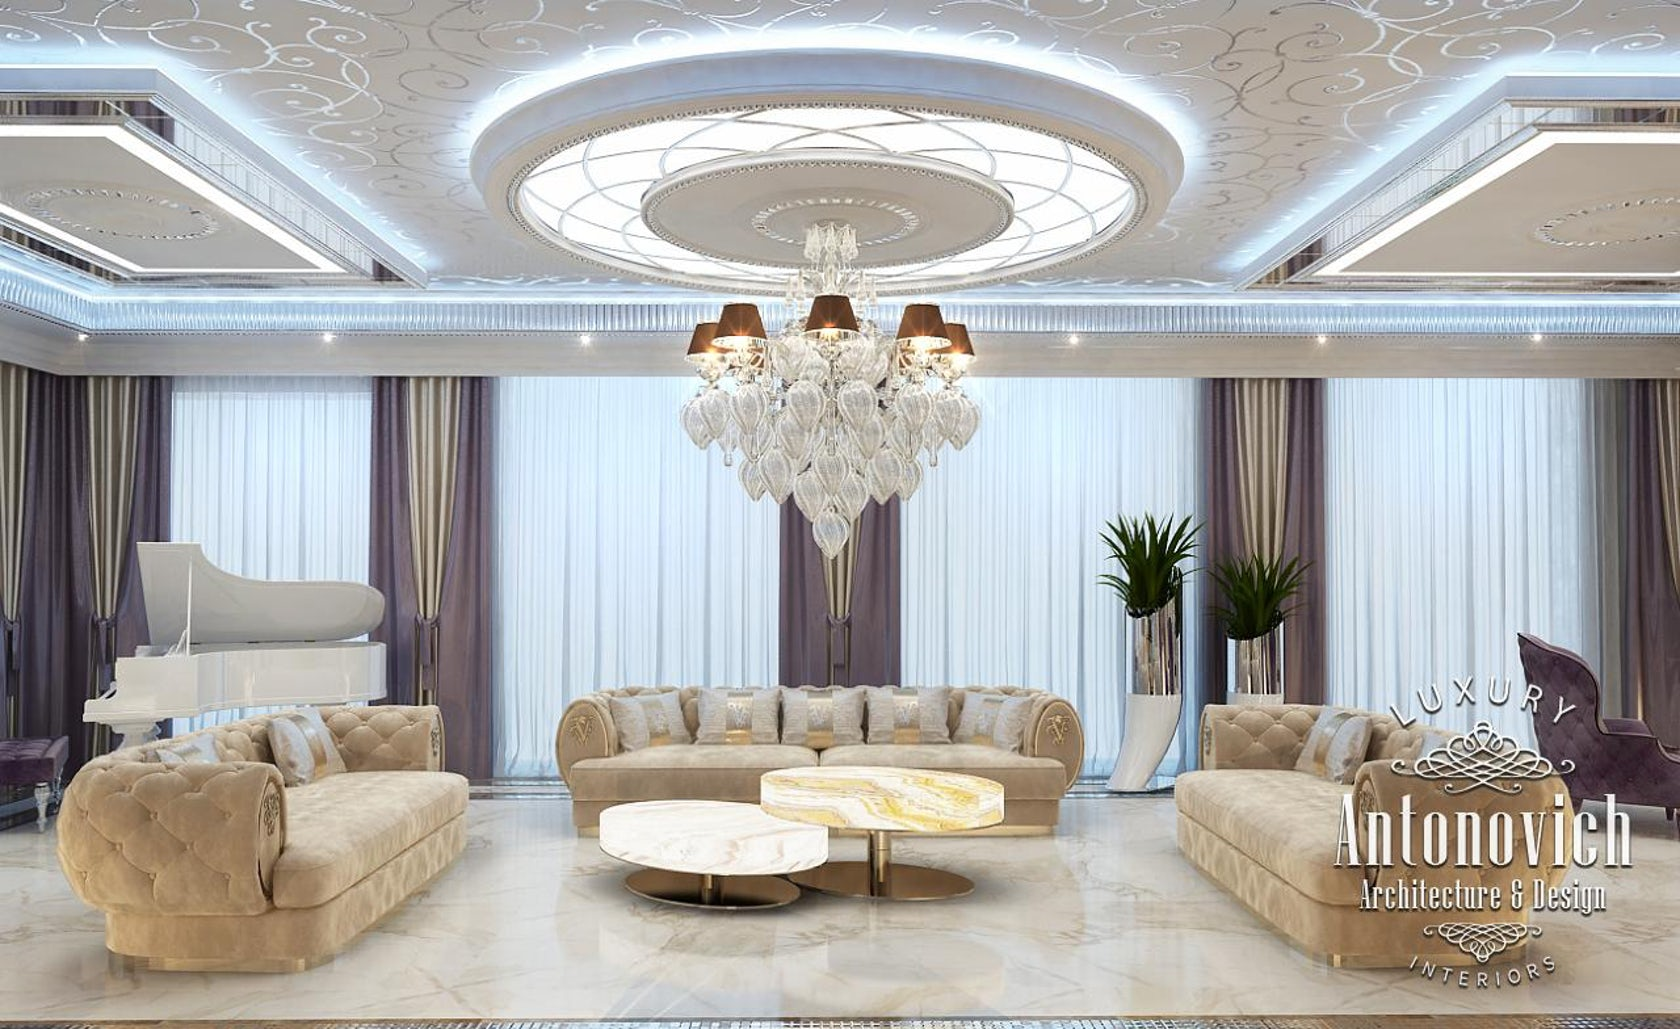 . Luxury interior design Dubai from Katrina Antonovich on Architizer